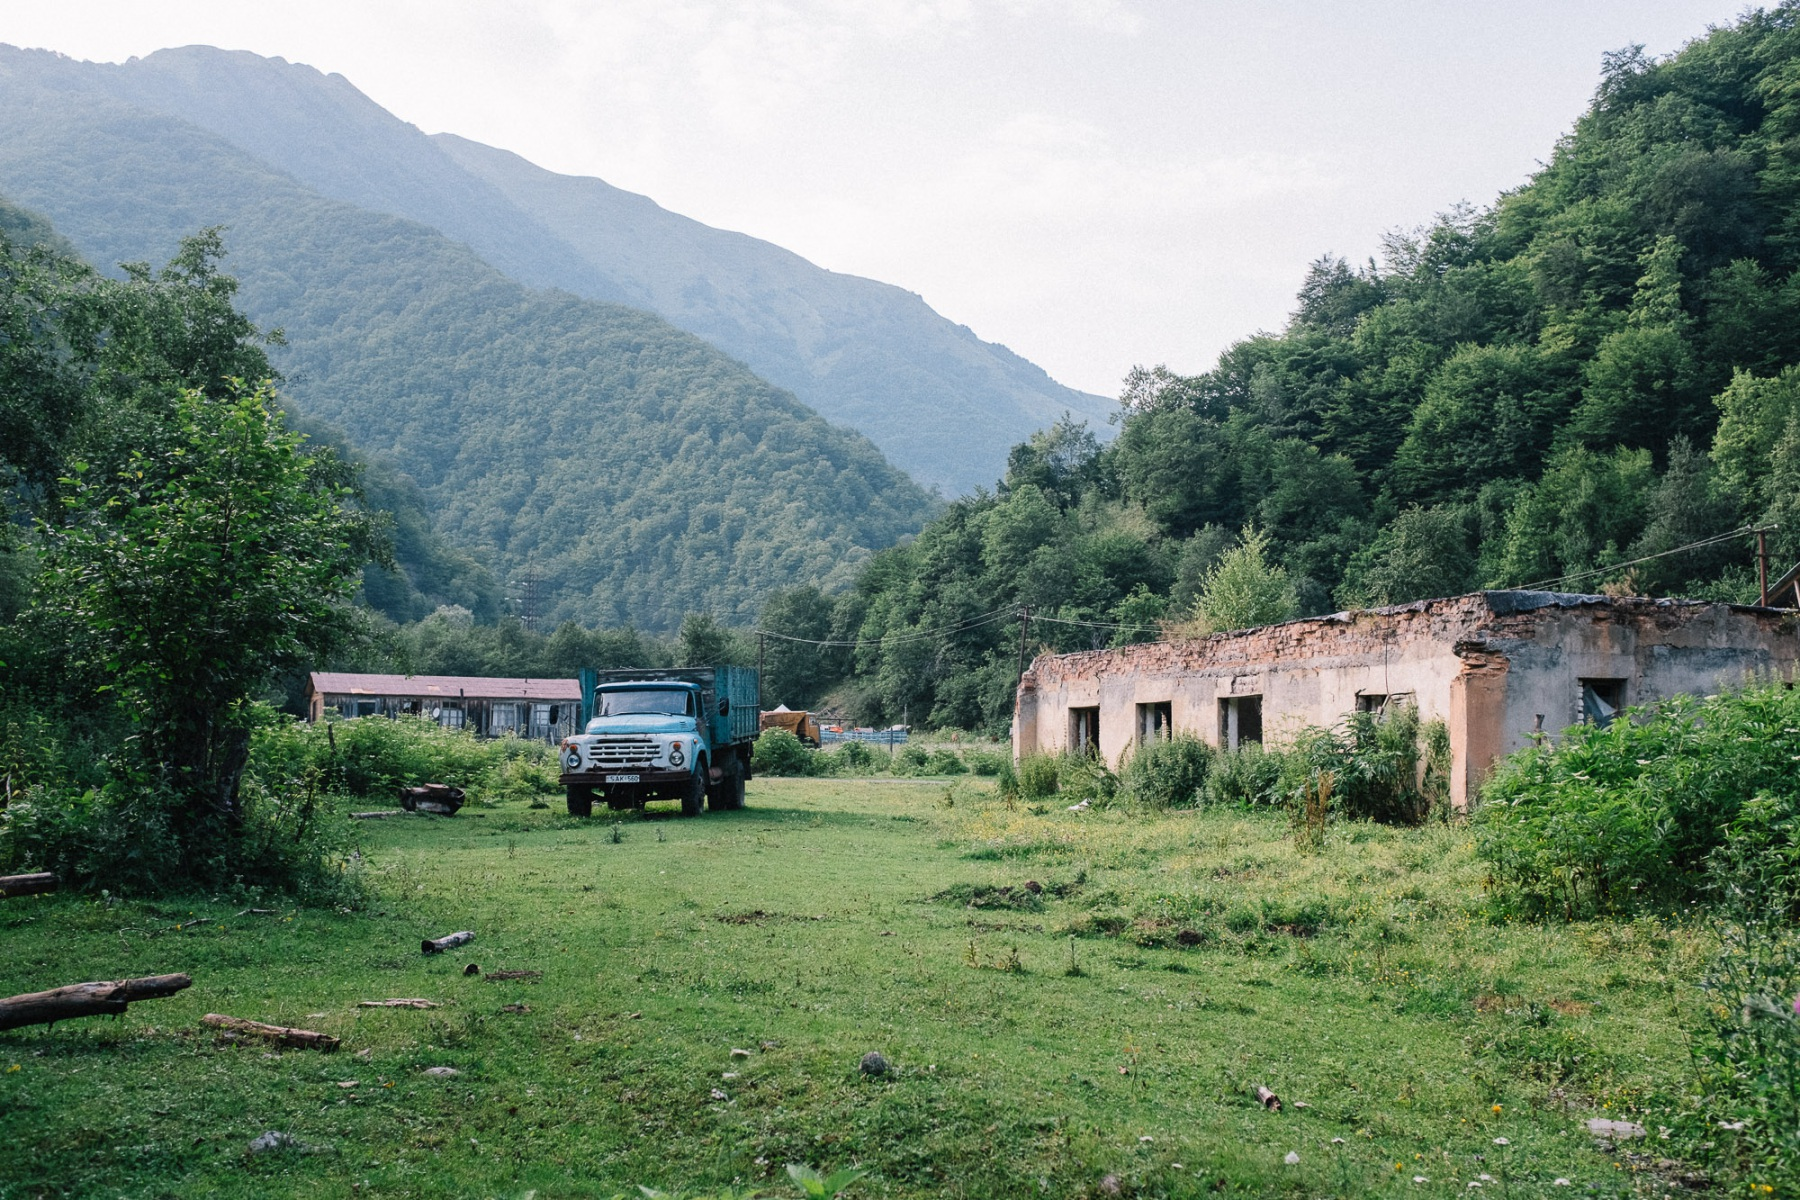 Old Soviet truck in Georgia